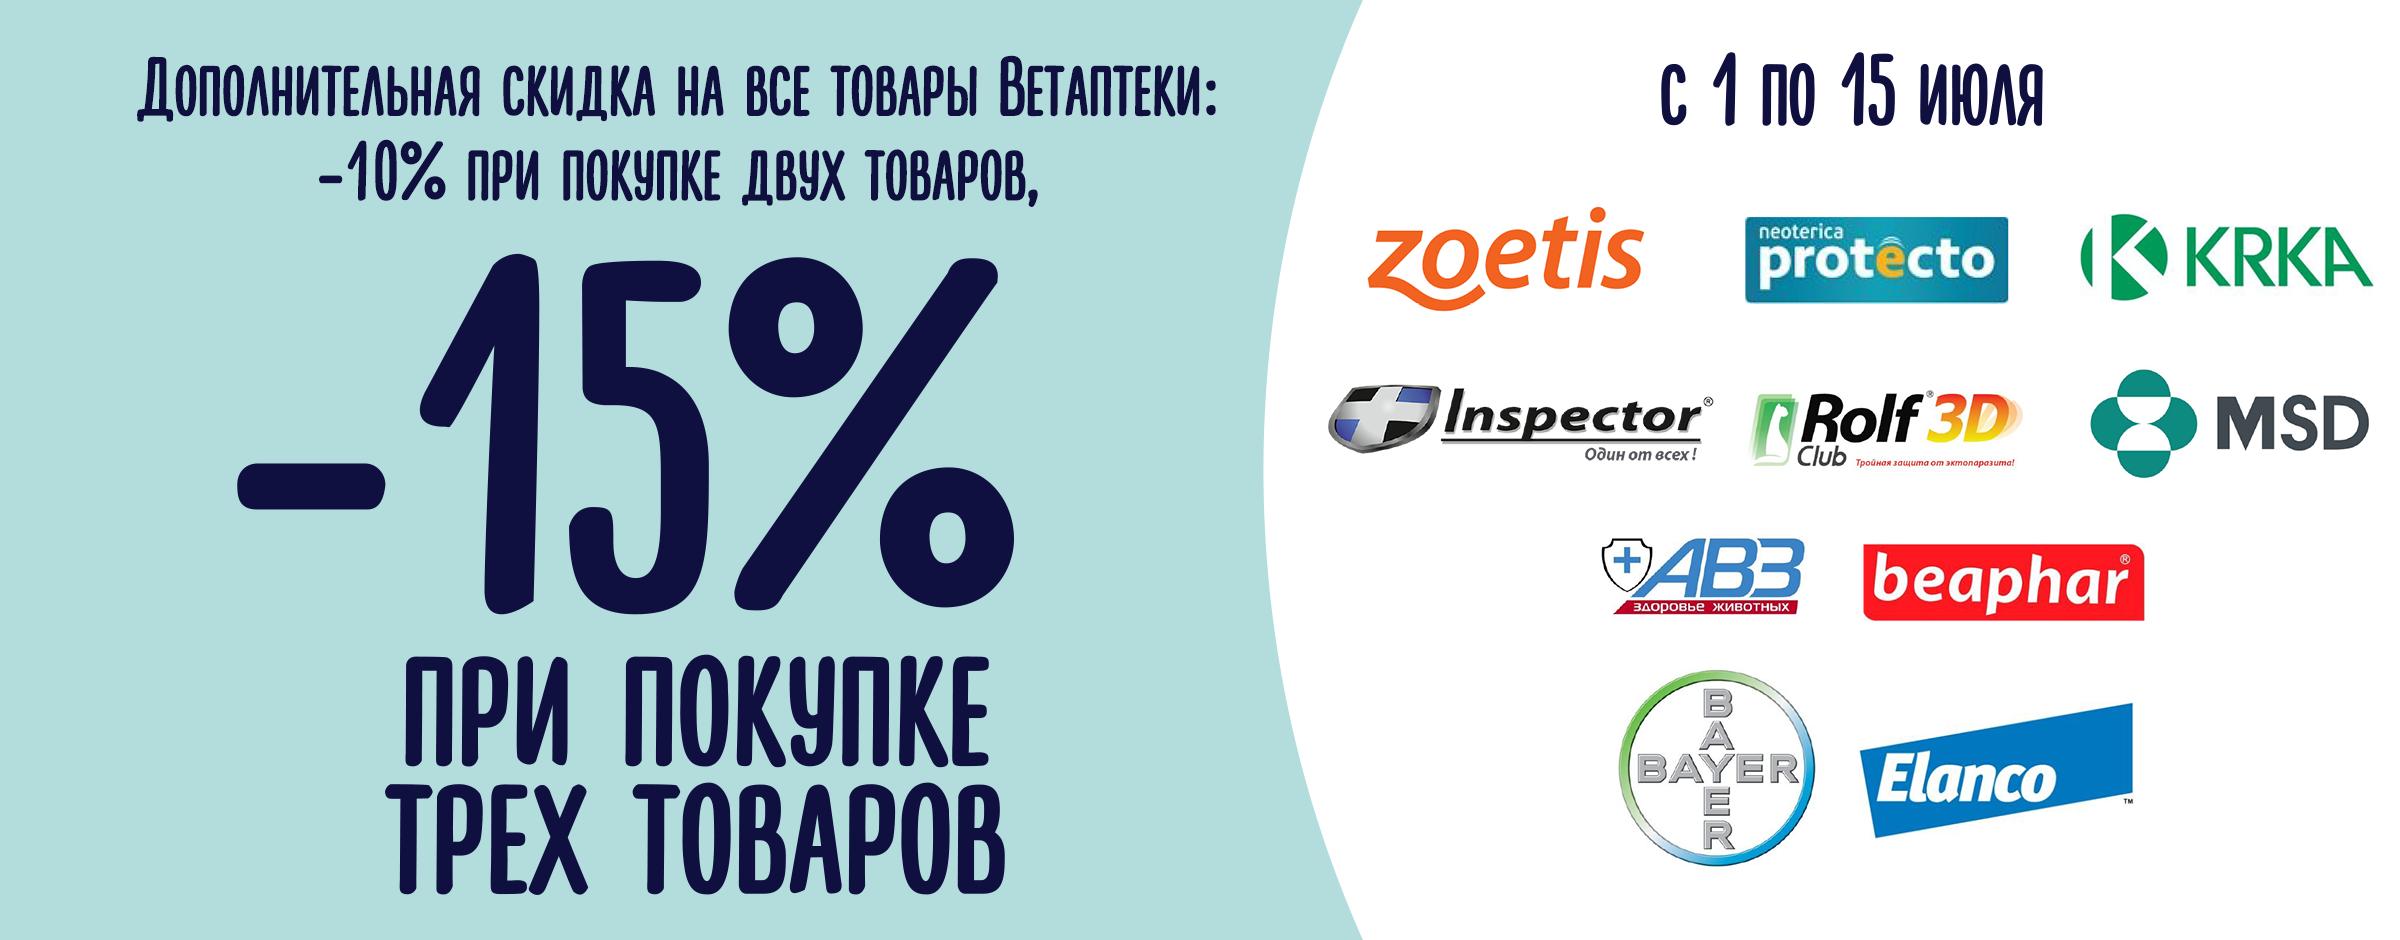 10-15% ветаптека